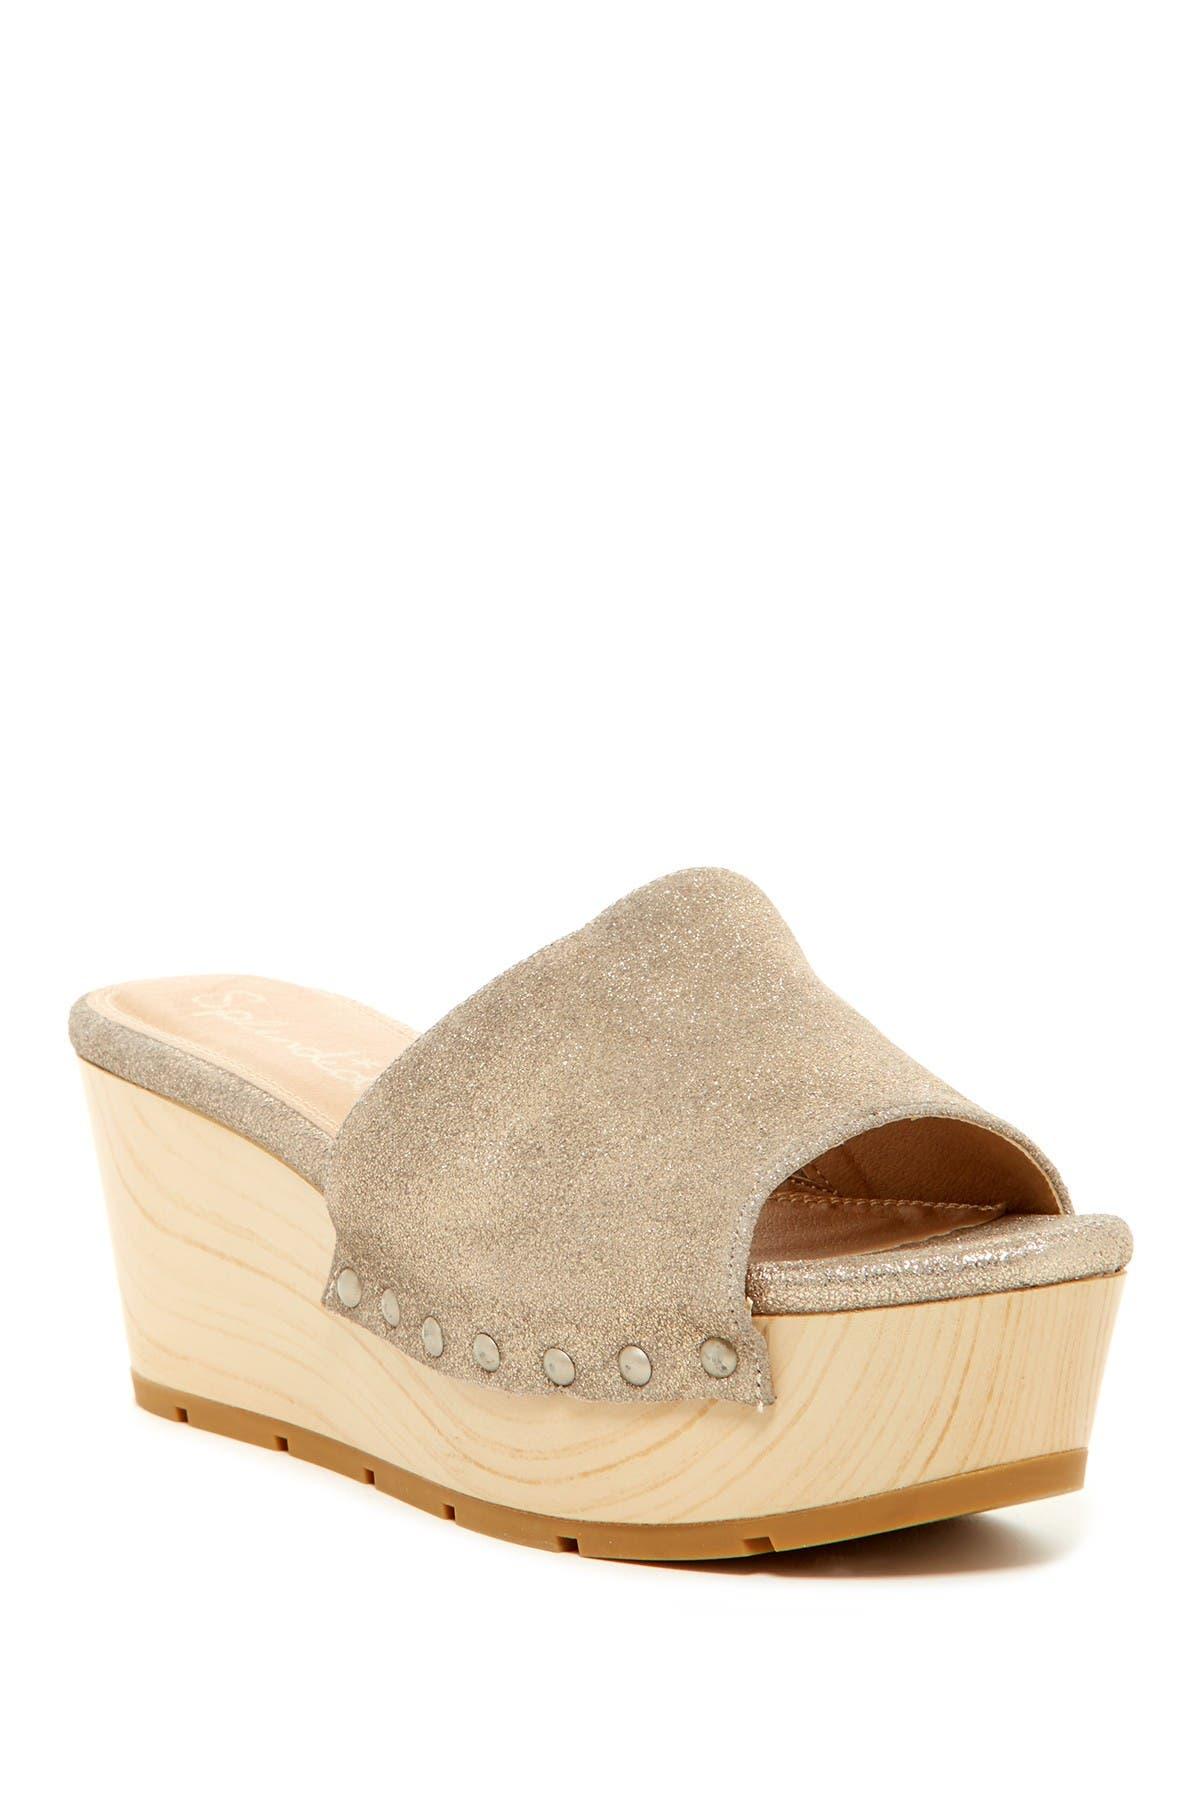 Image of Splendid Lana Platform Slide Sandal